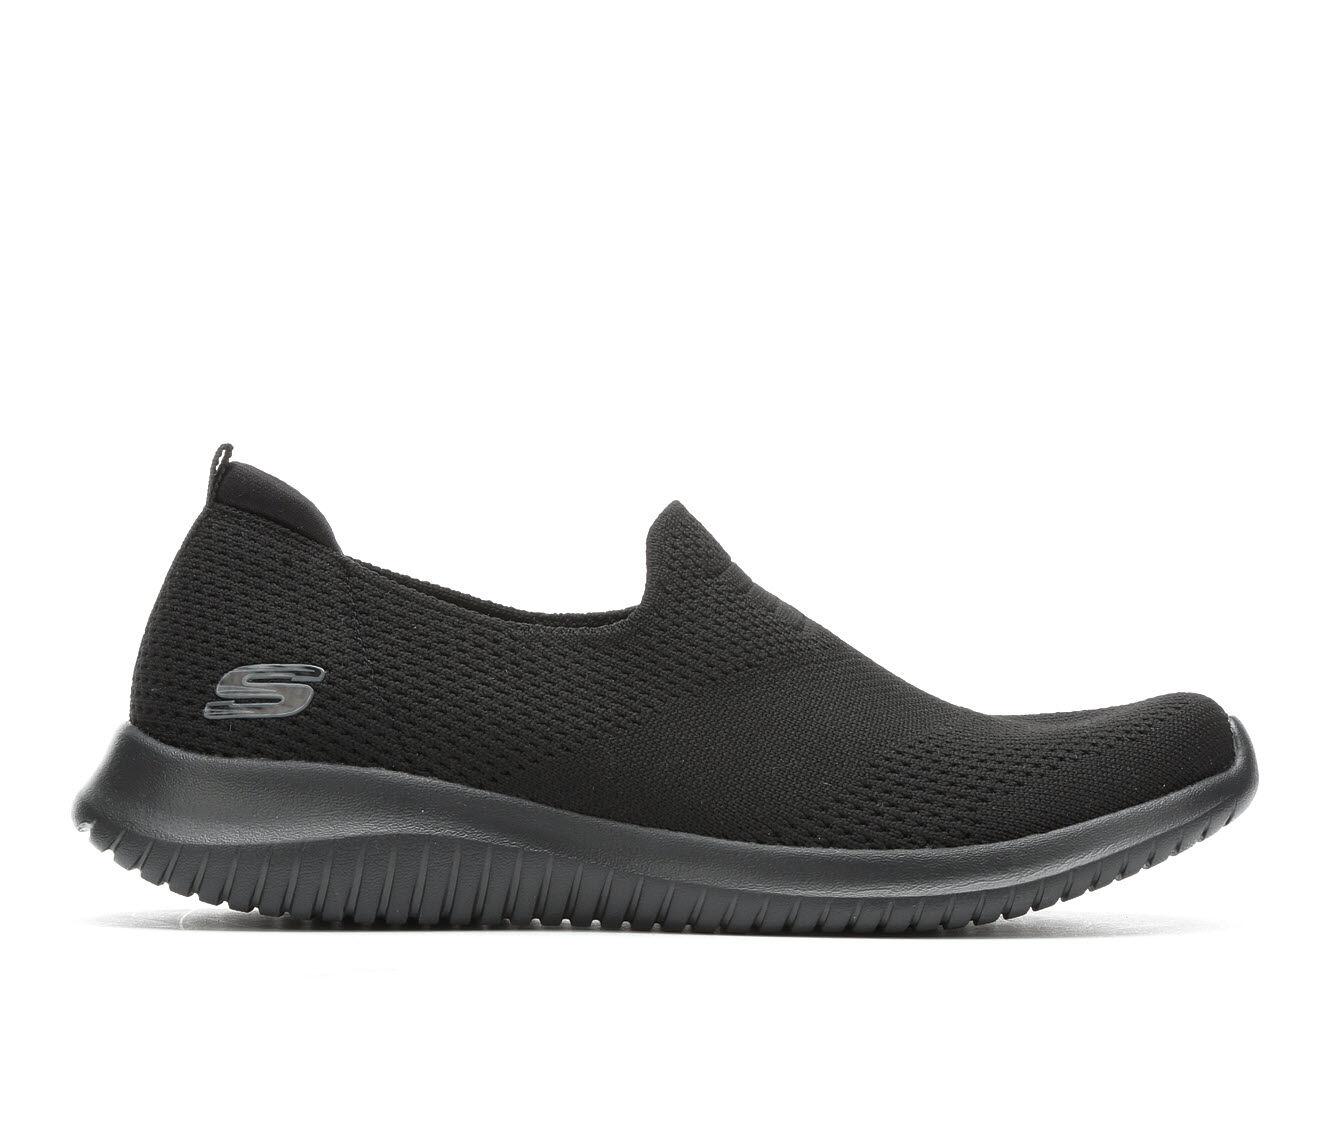 uk shoes_kd4555